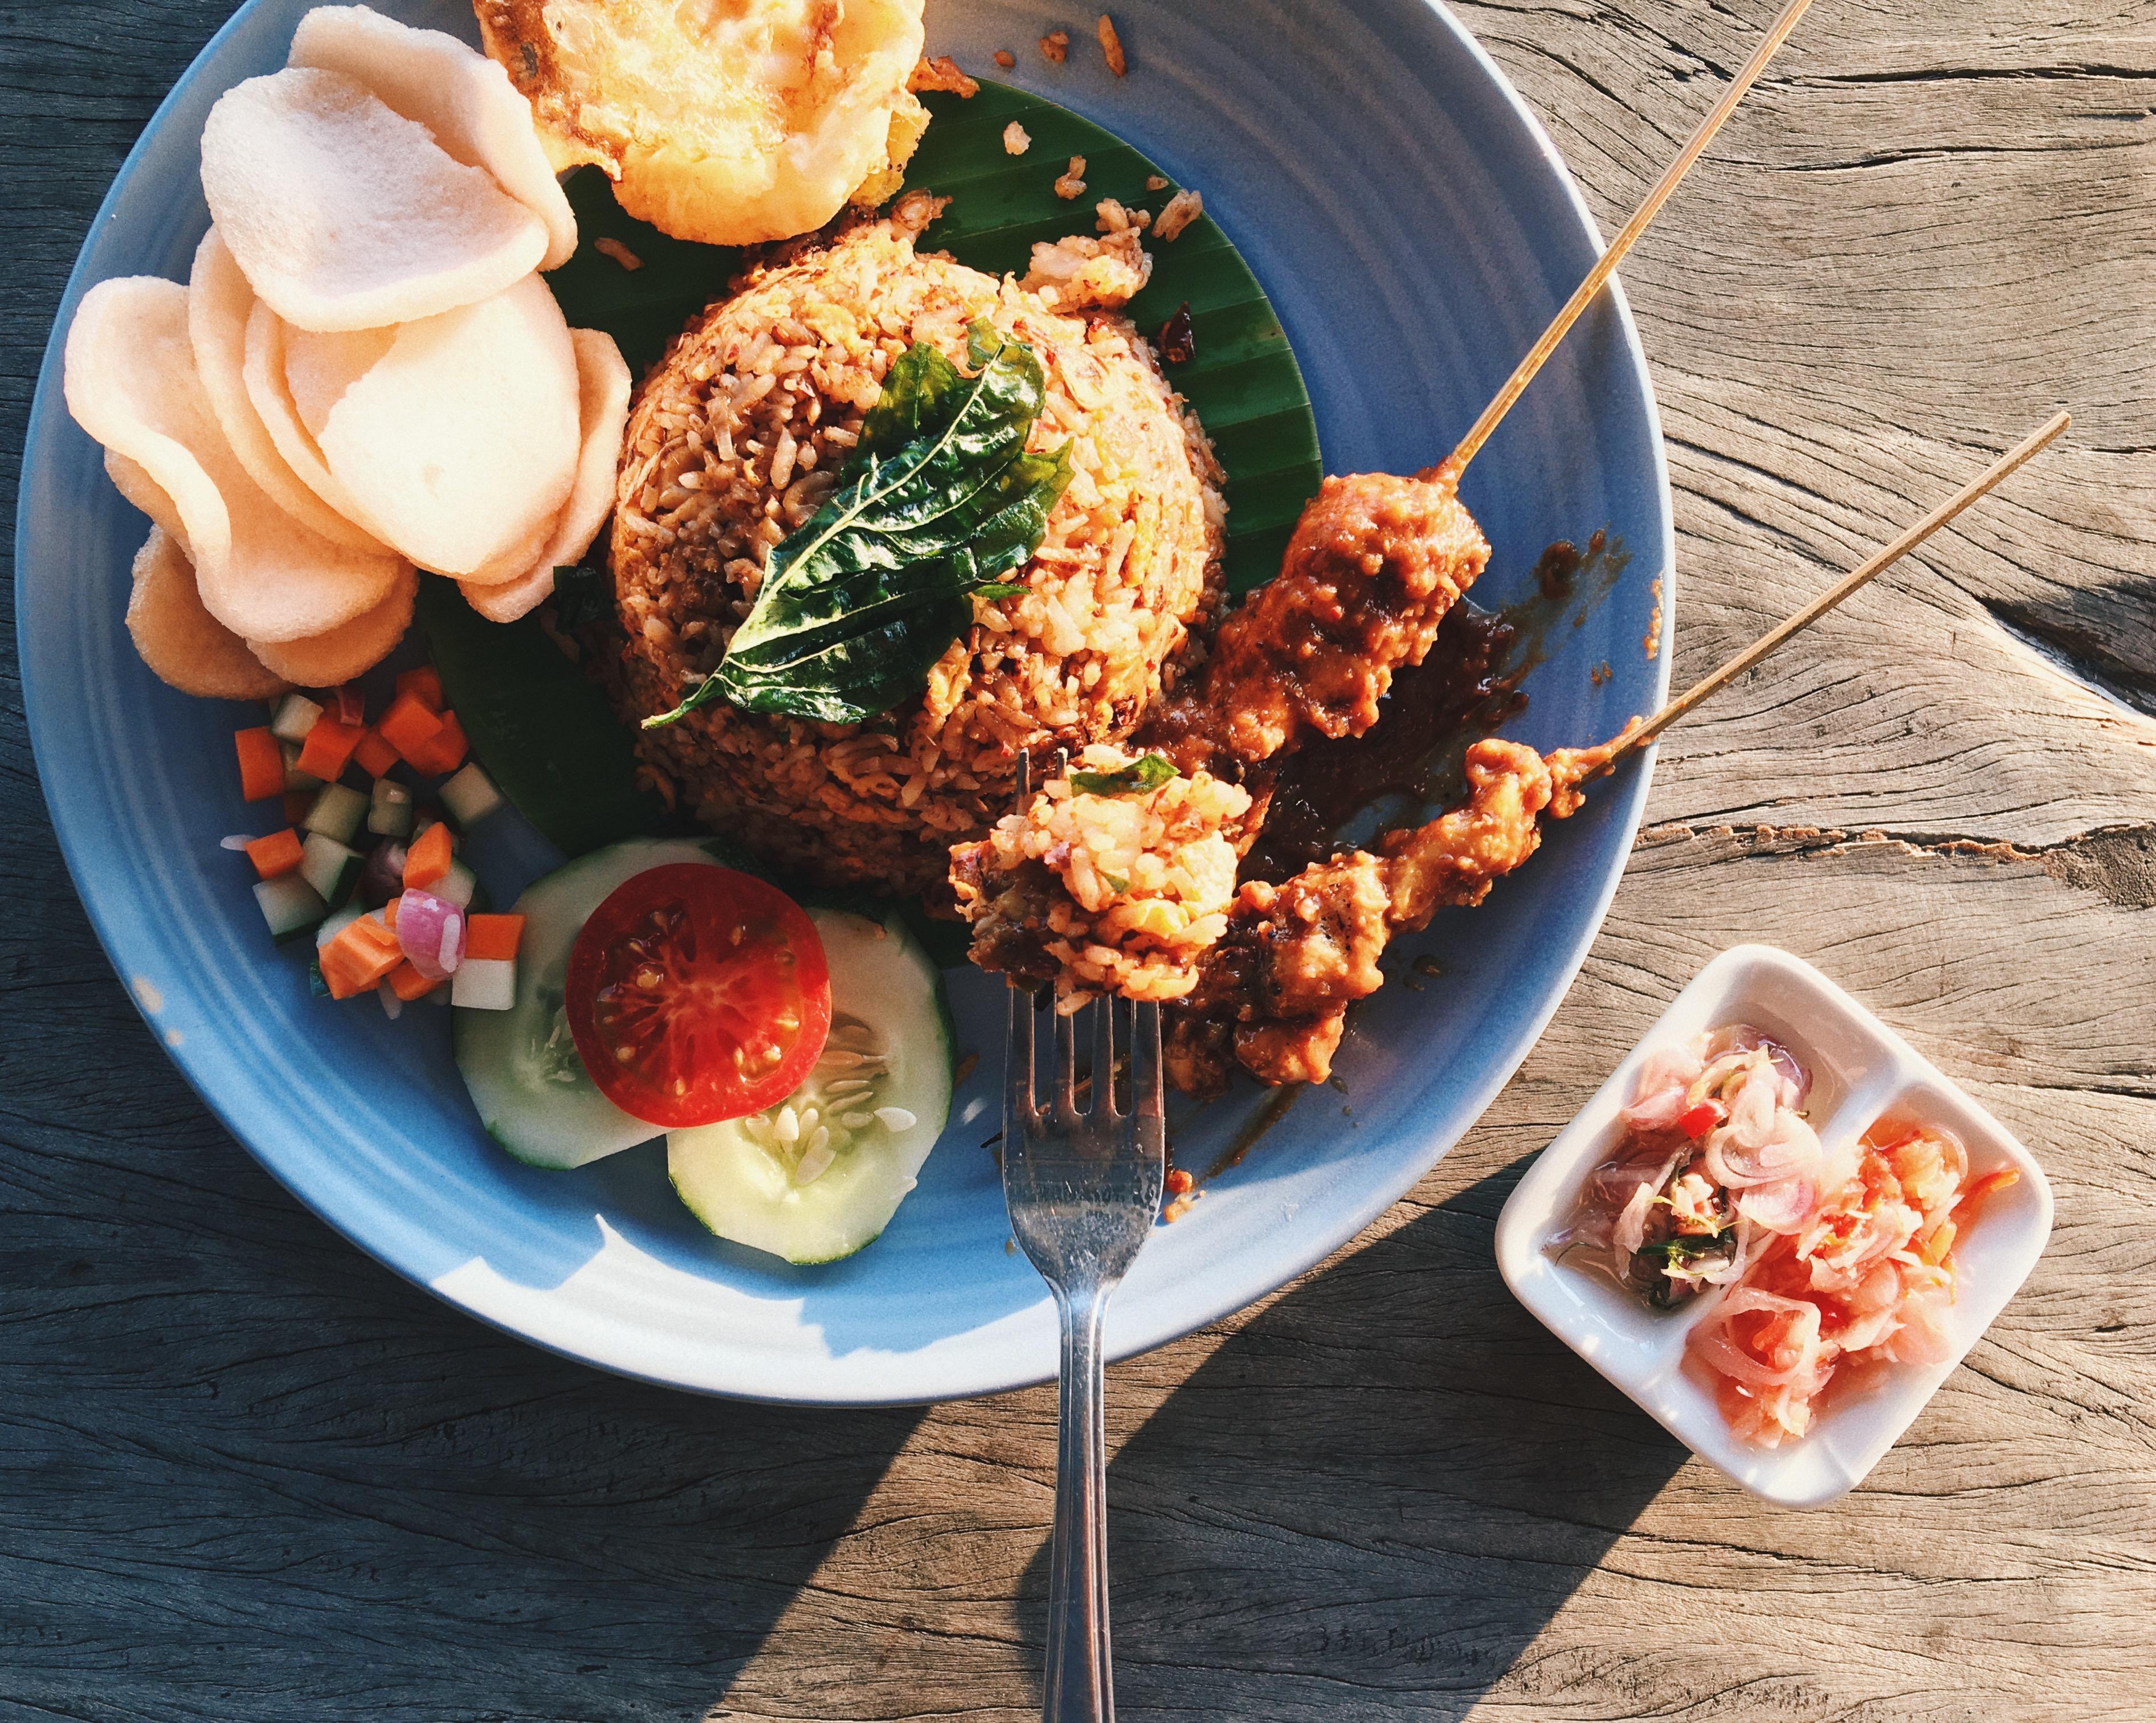 Atlantis-on-the-Rock-Food-on-Fork